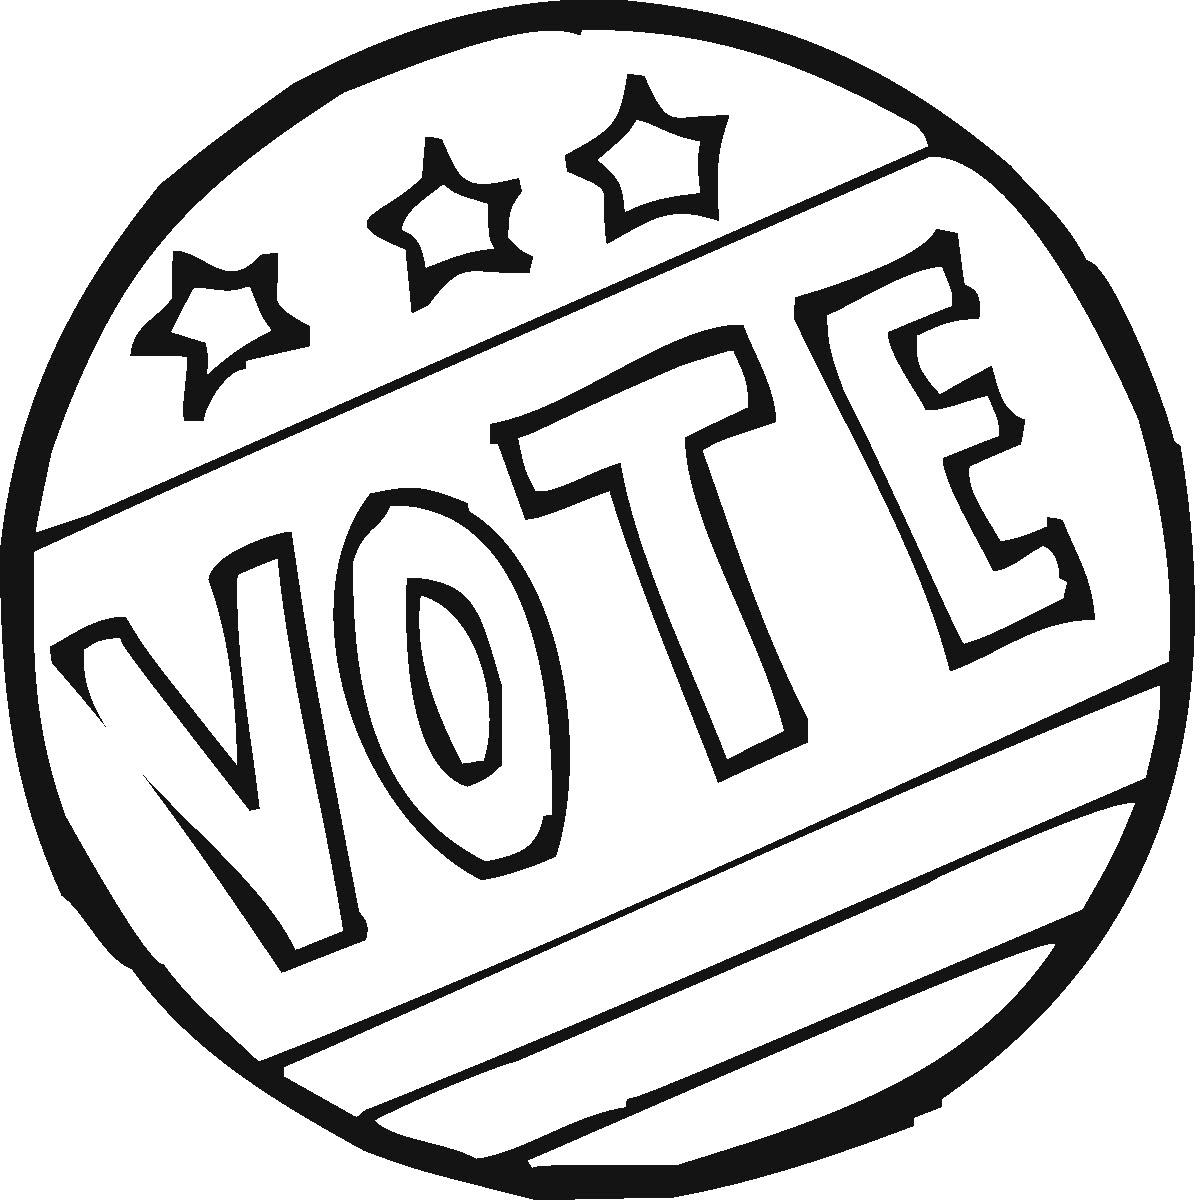 Waunablog: February 21 - Election Day